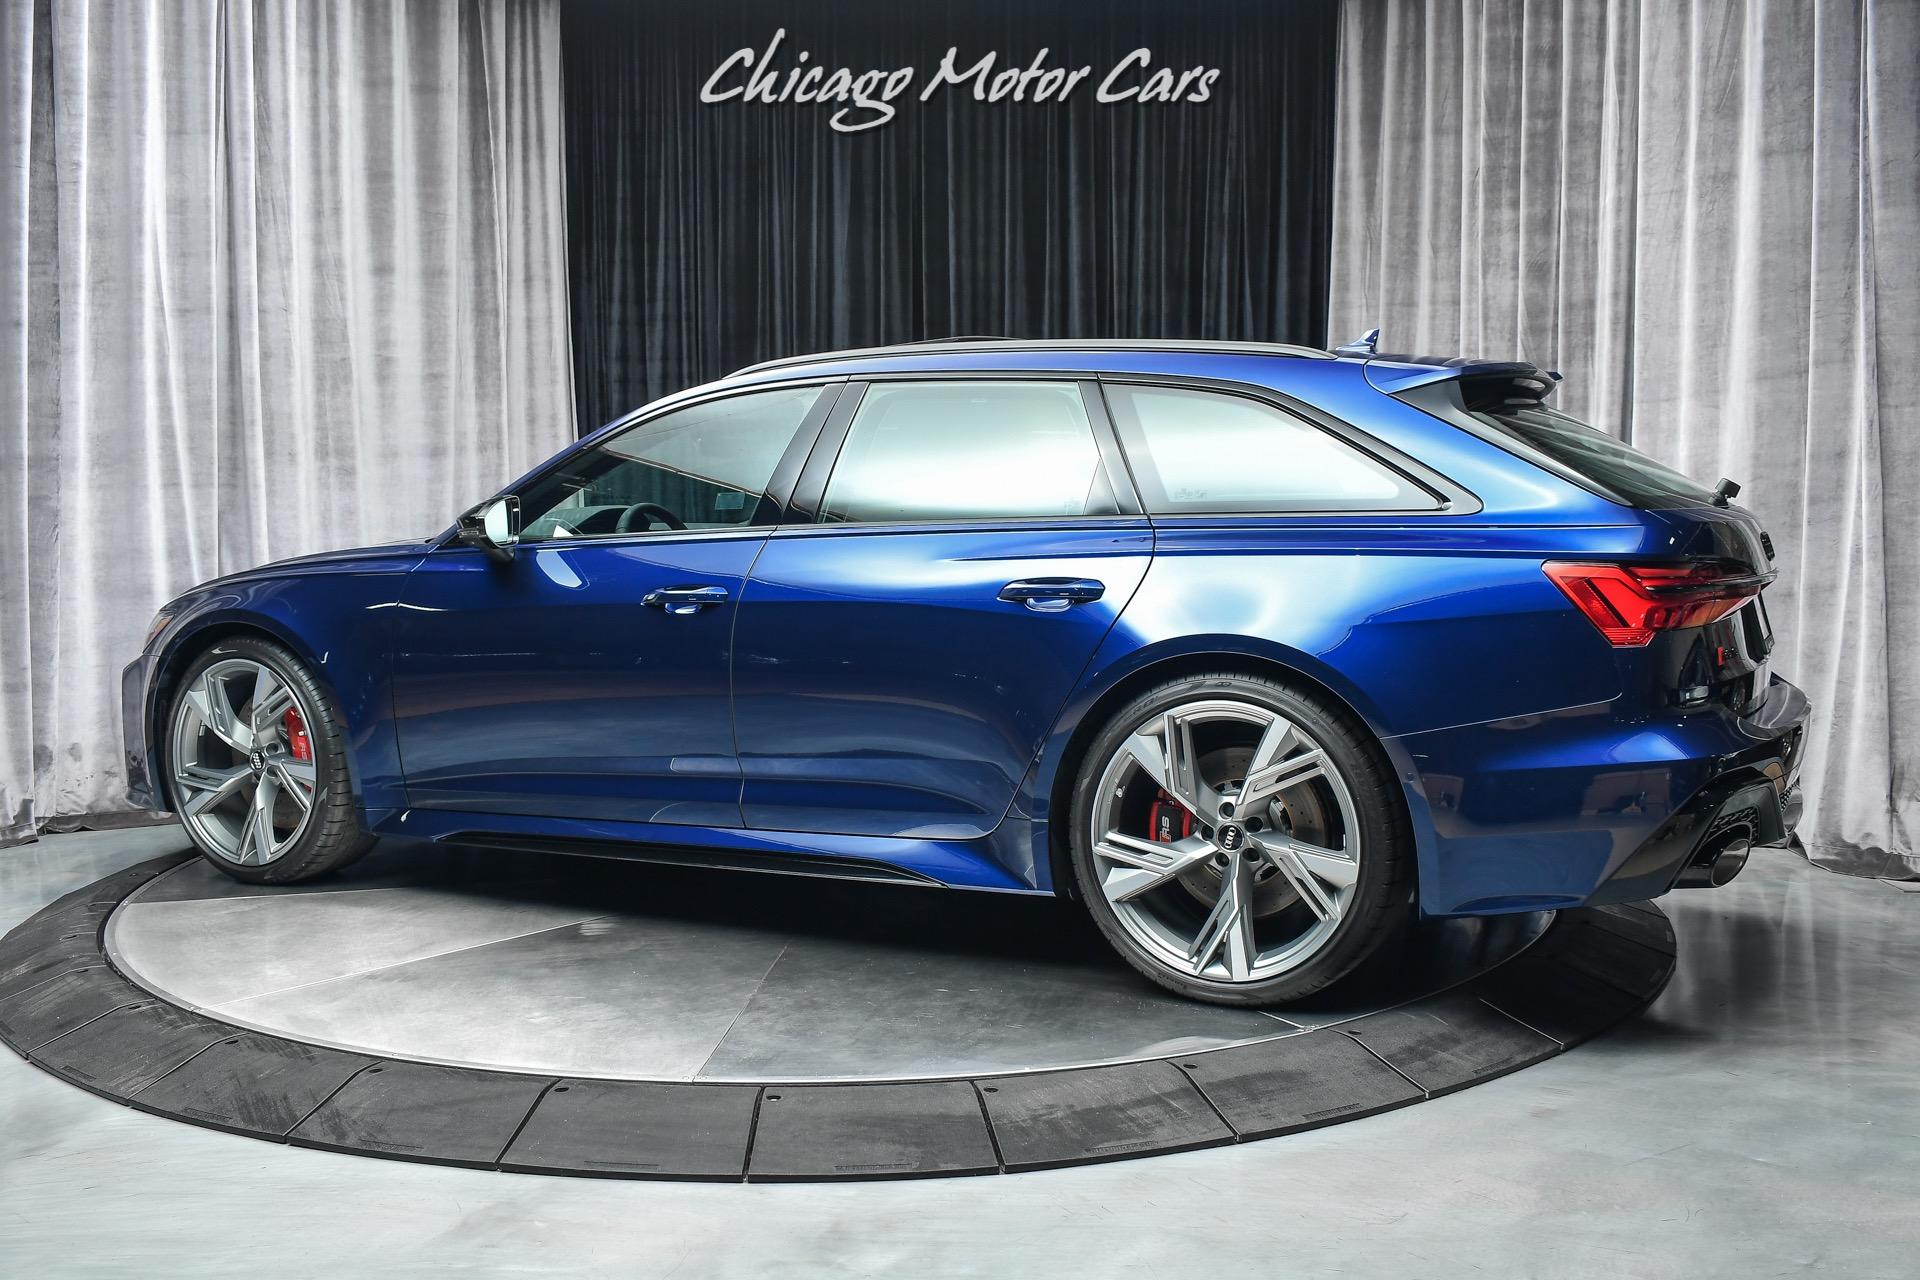 2021 Audi RS6 Avant - Chicago Motor Cars - United States ...